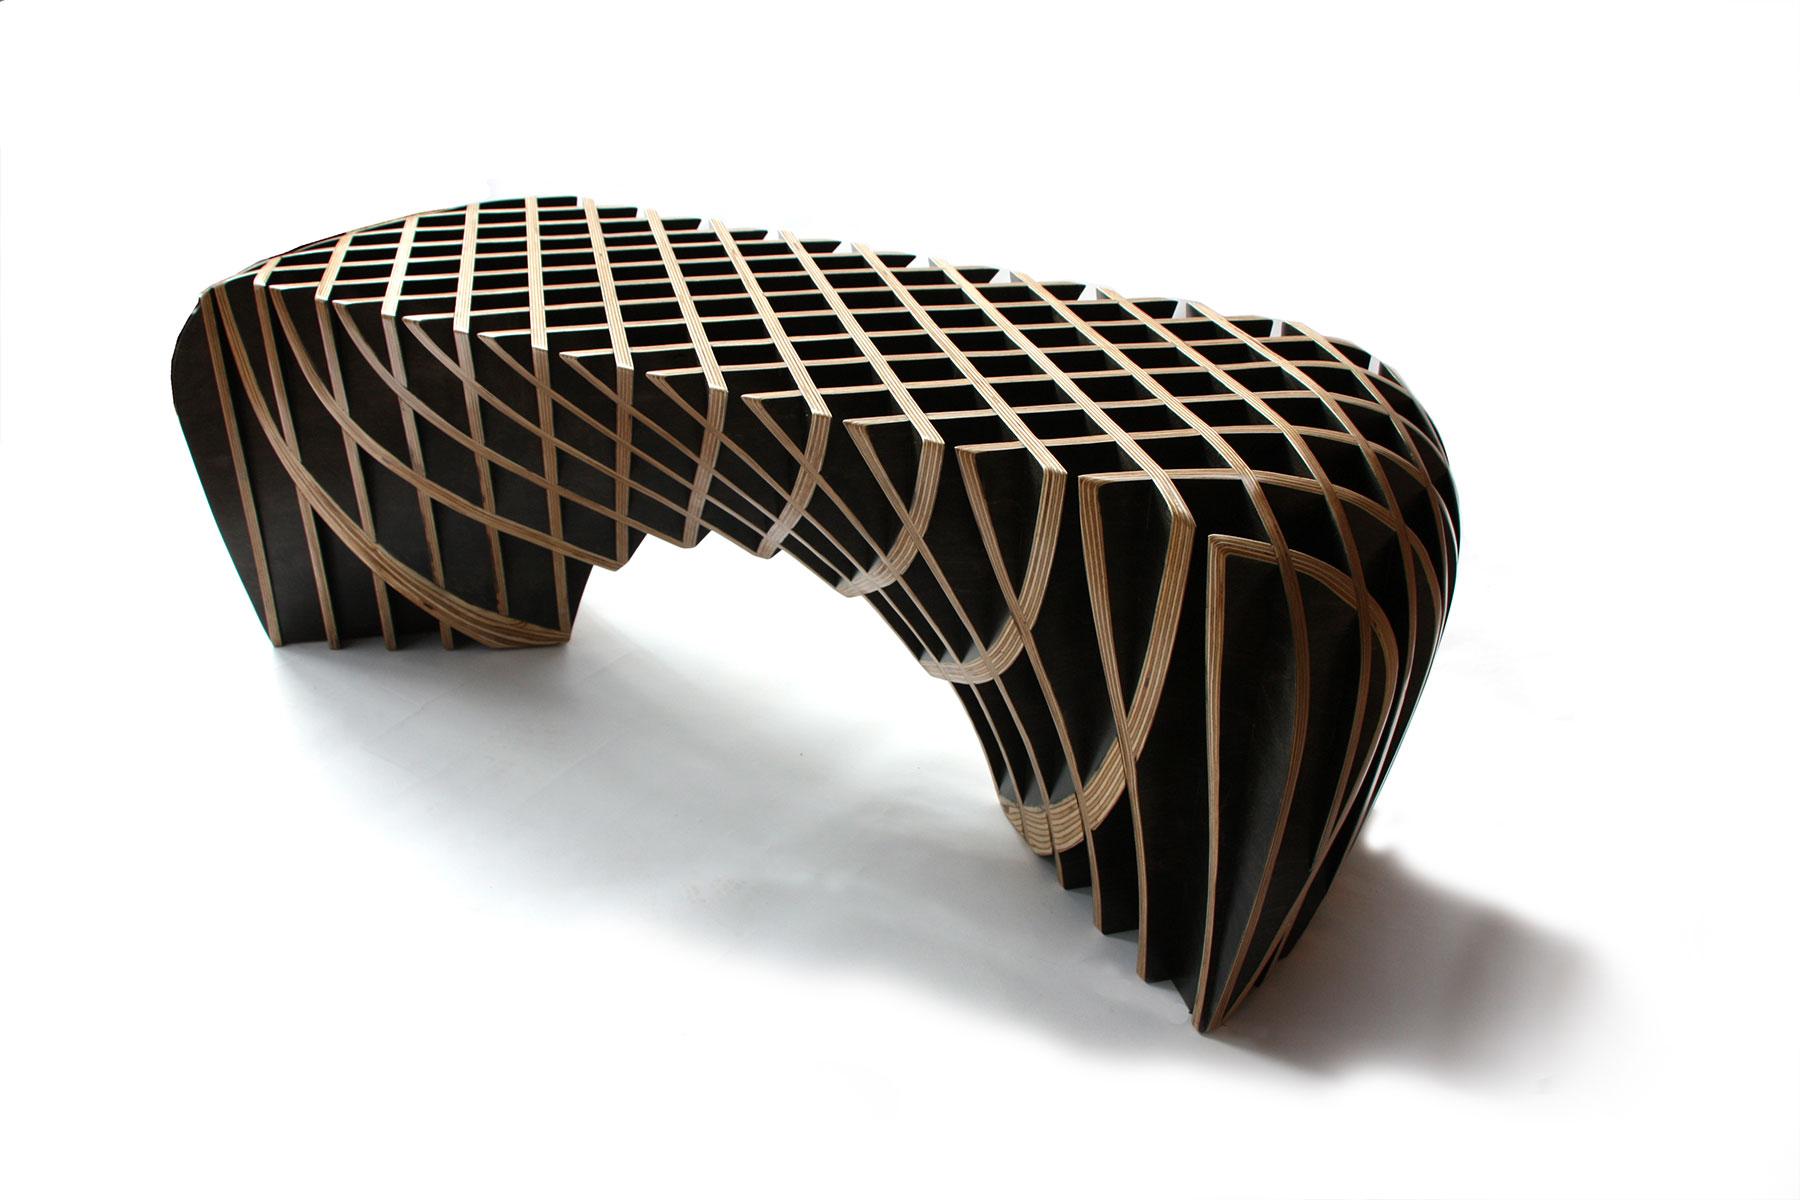 flake-bench-2.jpg